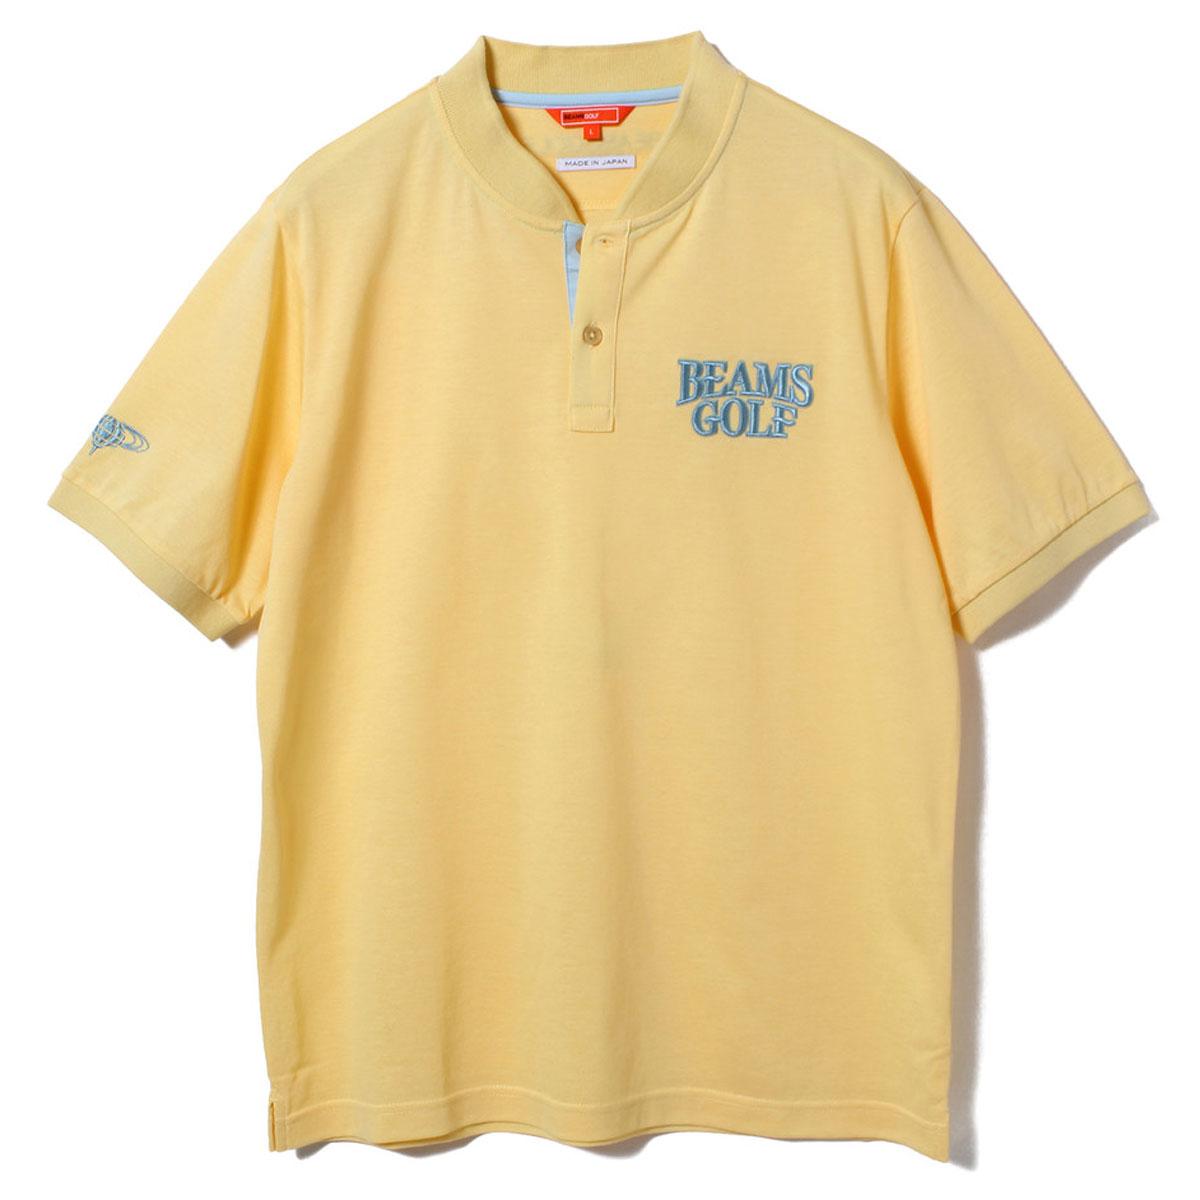 BEAMS GOLF ORANGE LABEL スタンドカラー 鹿の子 ポロシャツ